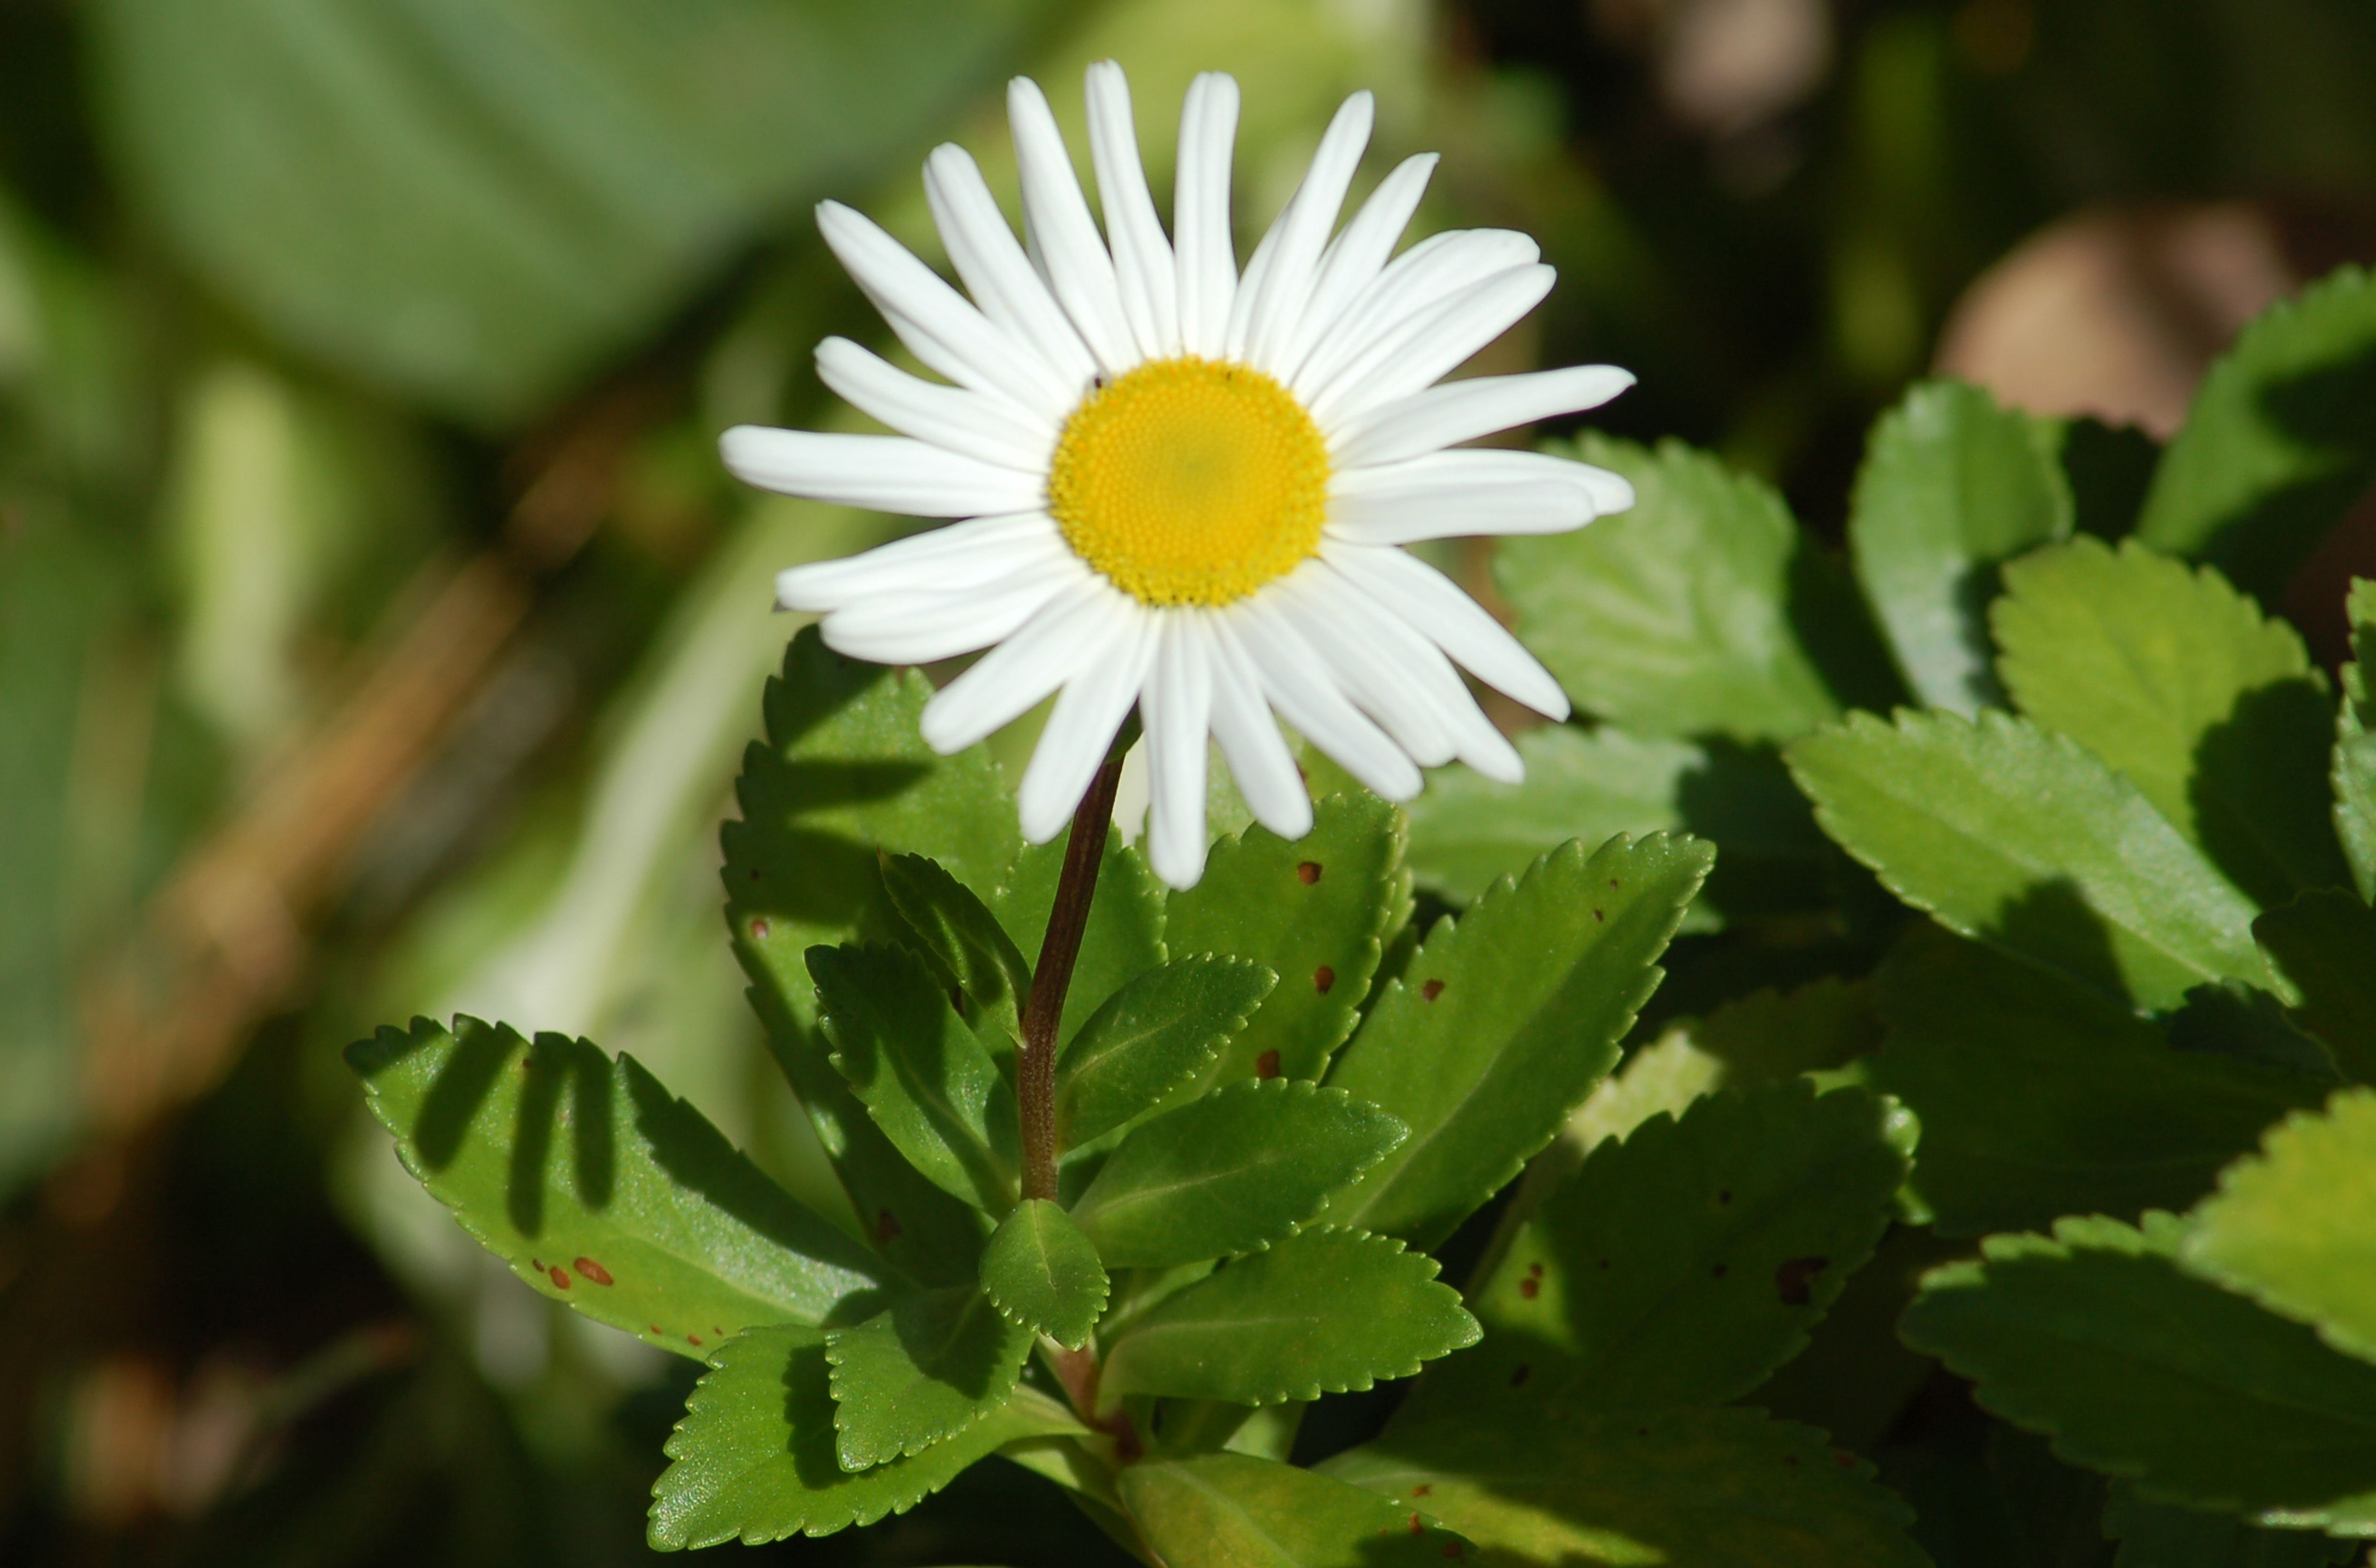 Montauk daisy plant in flower.